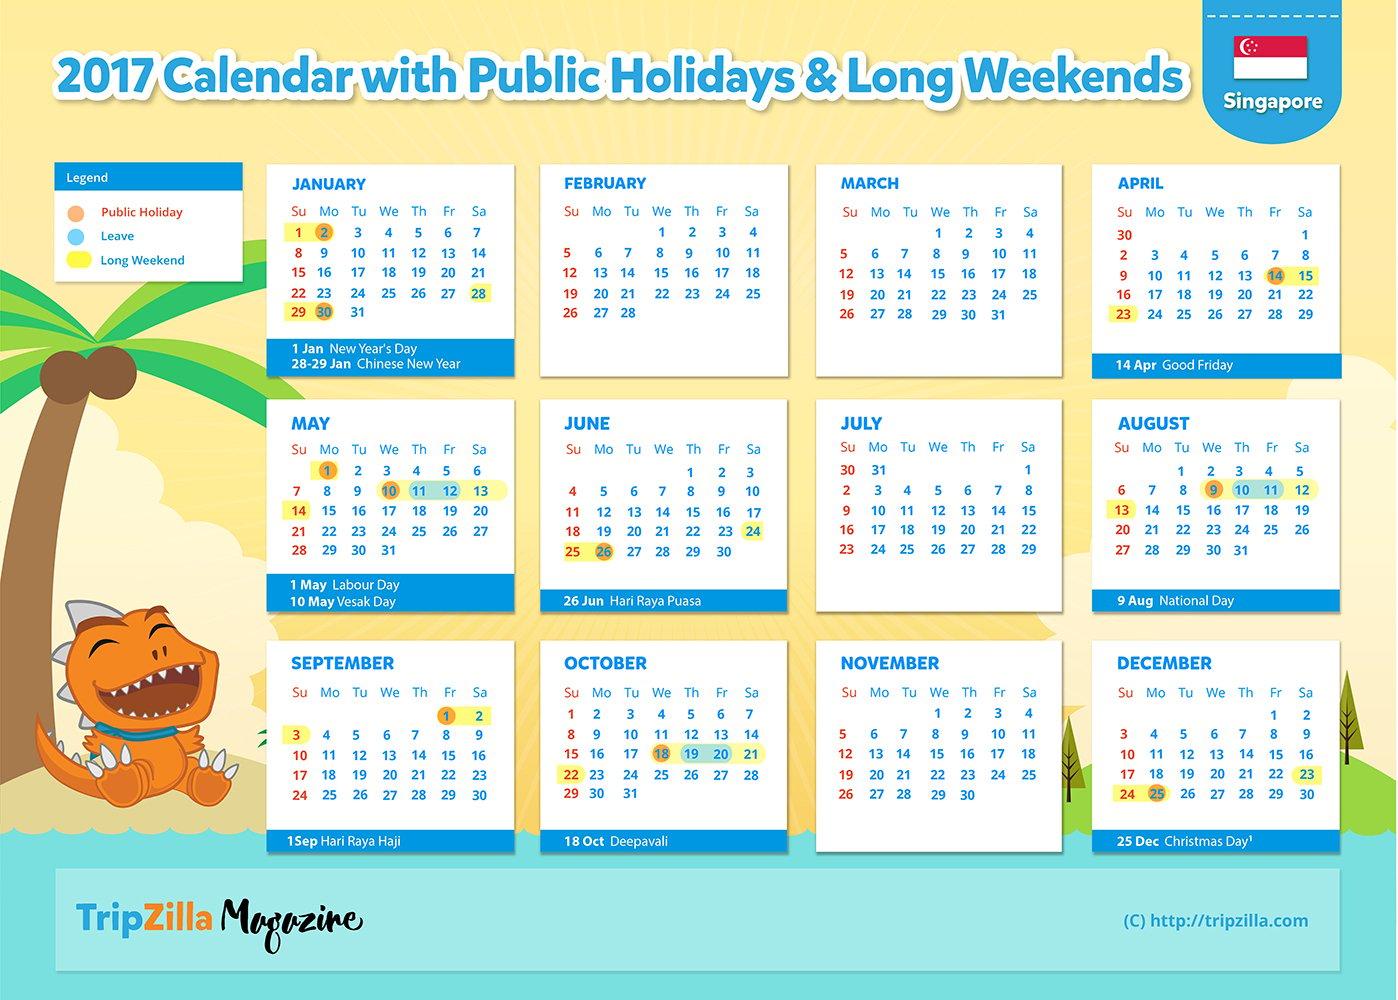 TripZilla Magazine - Singapore 2017 Long Weekends Calendar CHEATSHEET